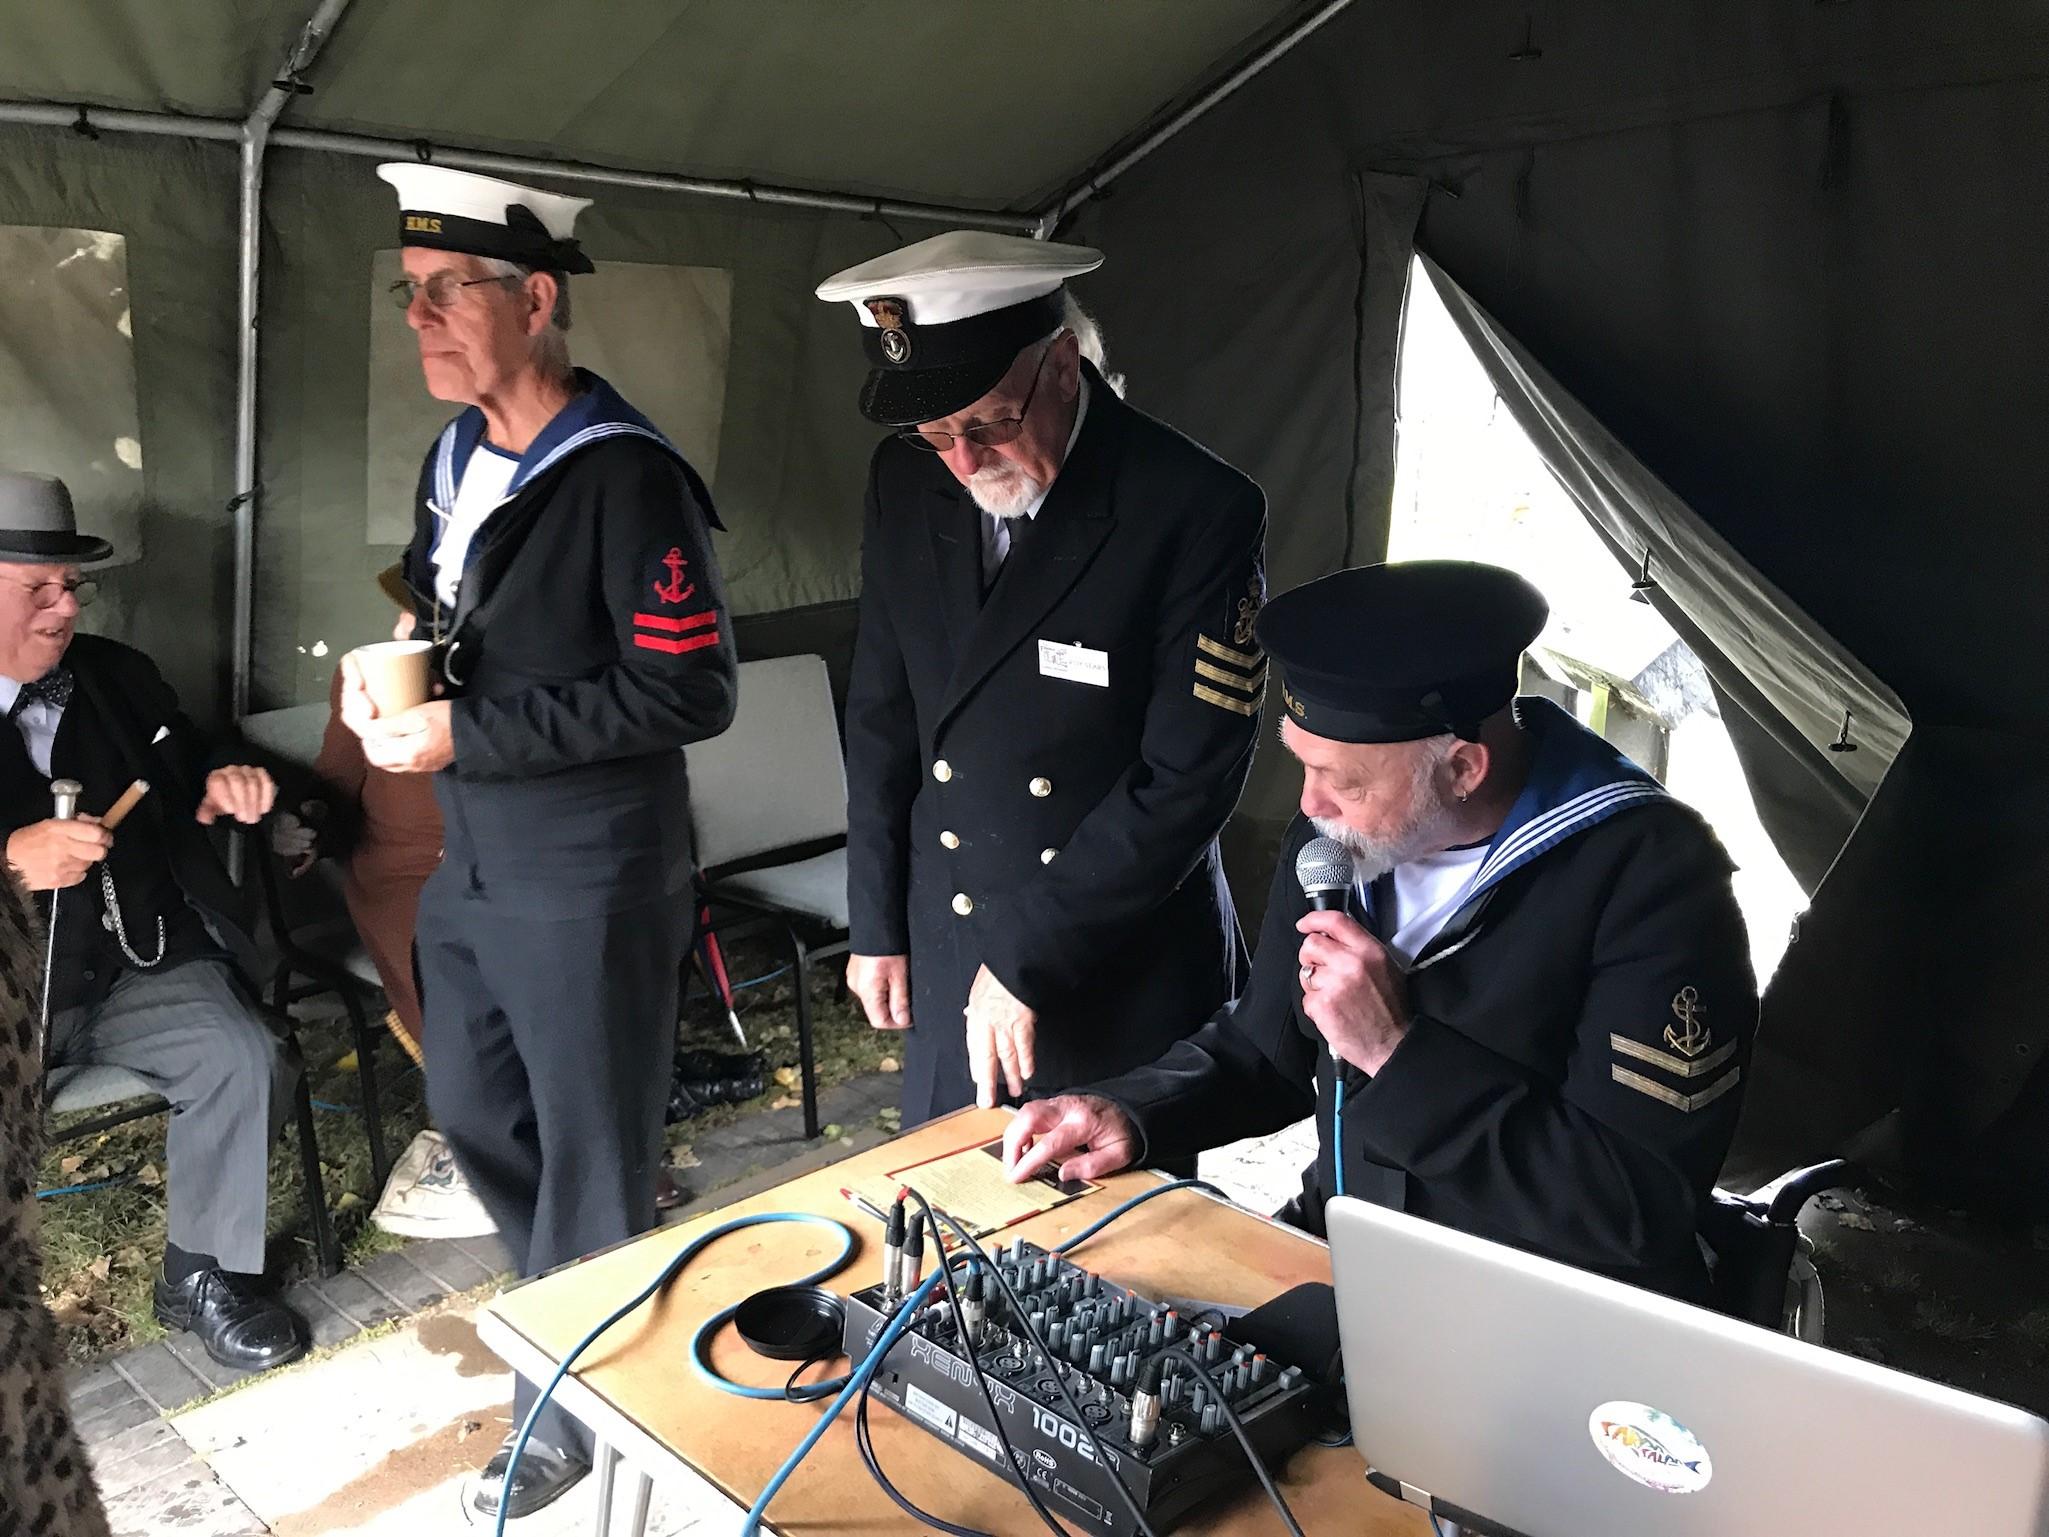 20170909 Village At War Stoke Bruene [05].jpg